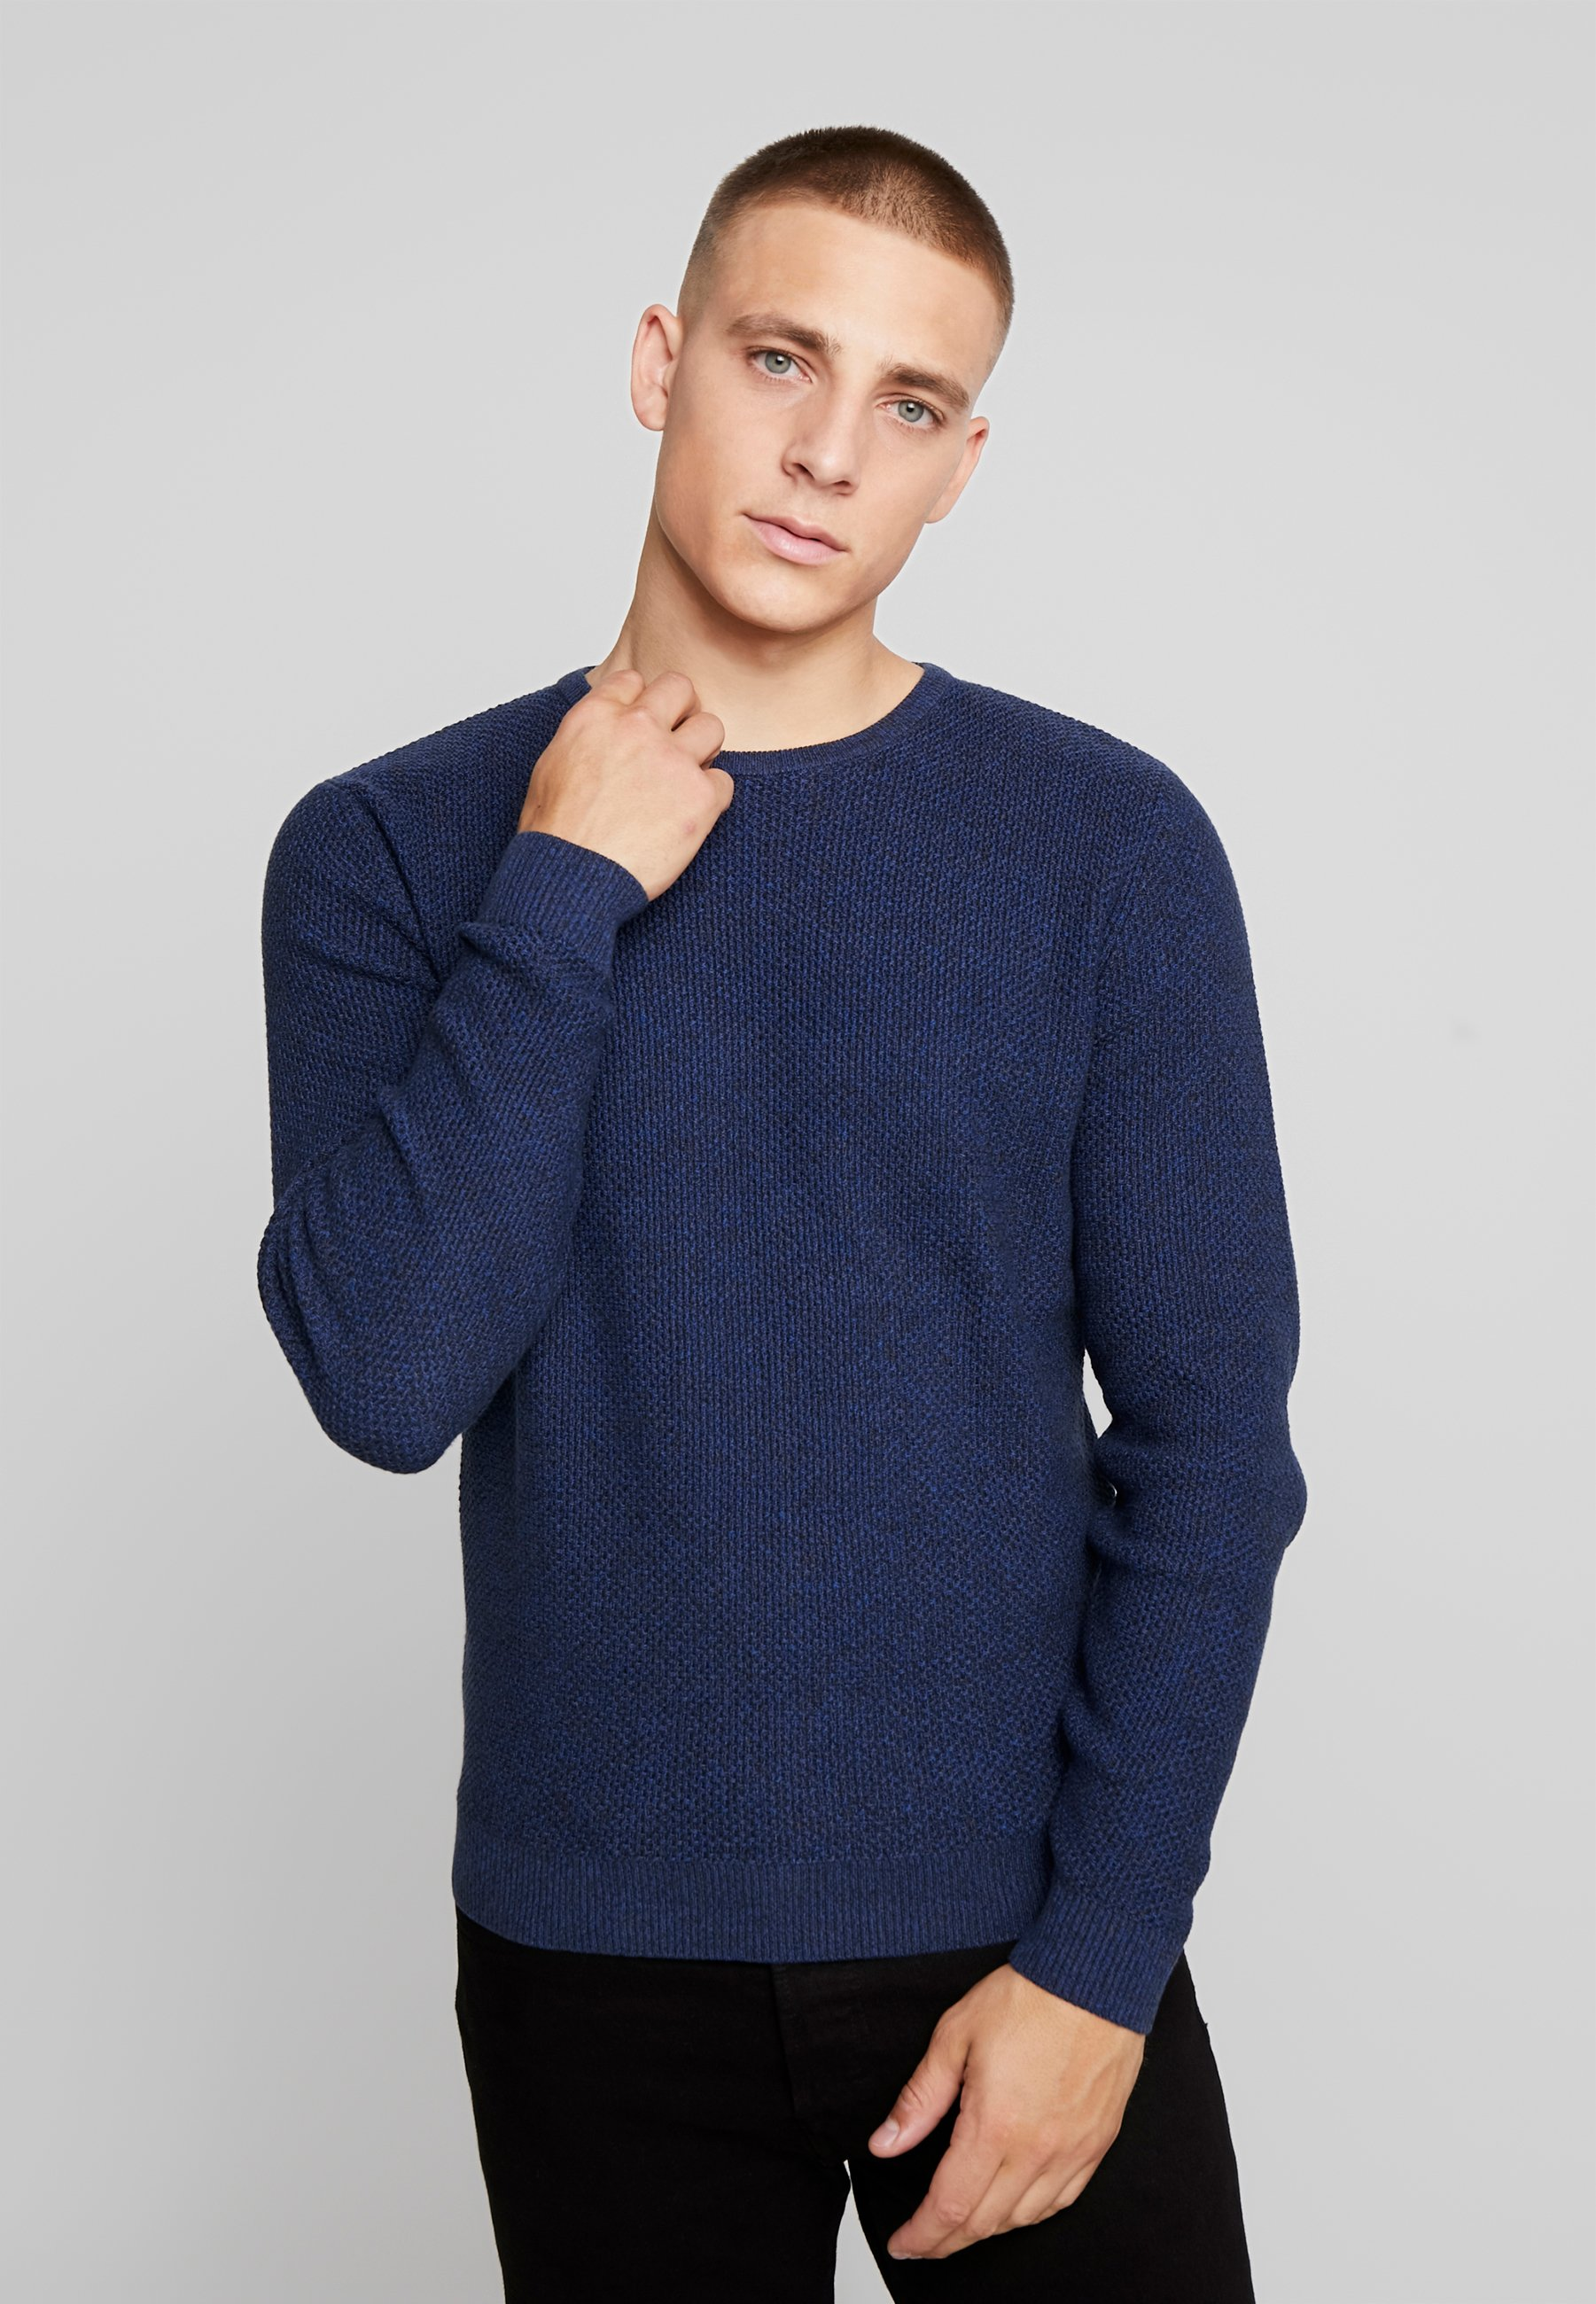 Homme MODERN BASIC STRUCTURE - Pullover - navy blue/ dark grey mouline